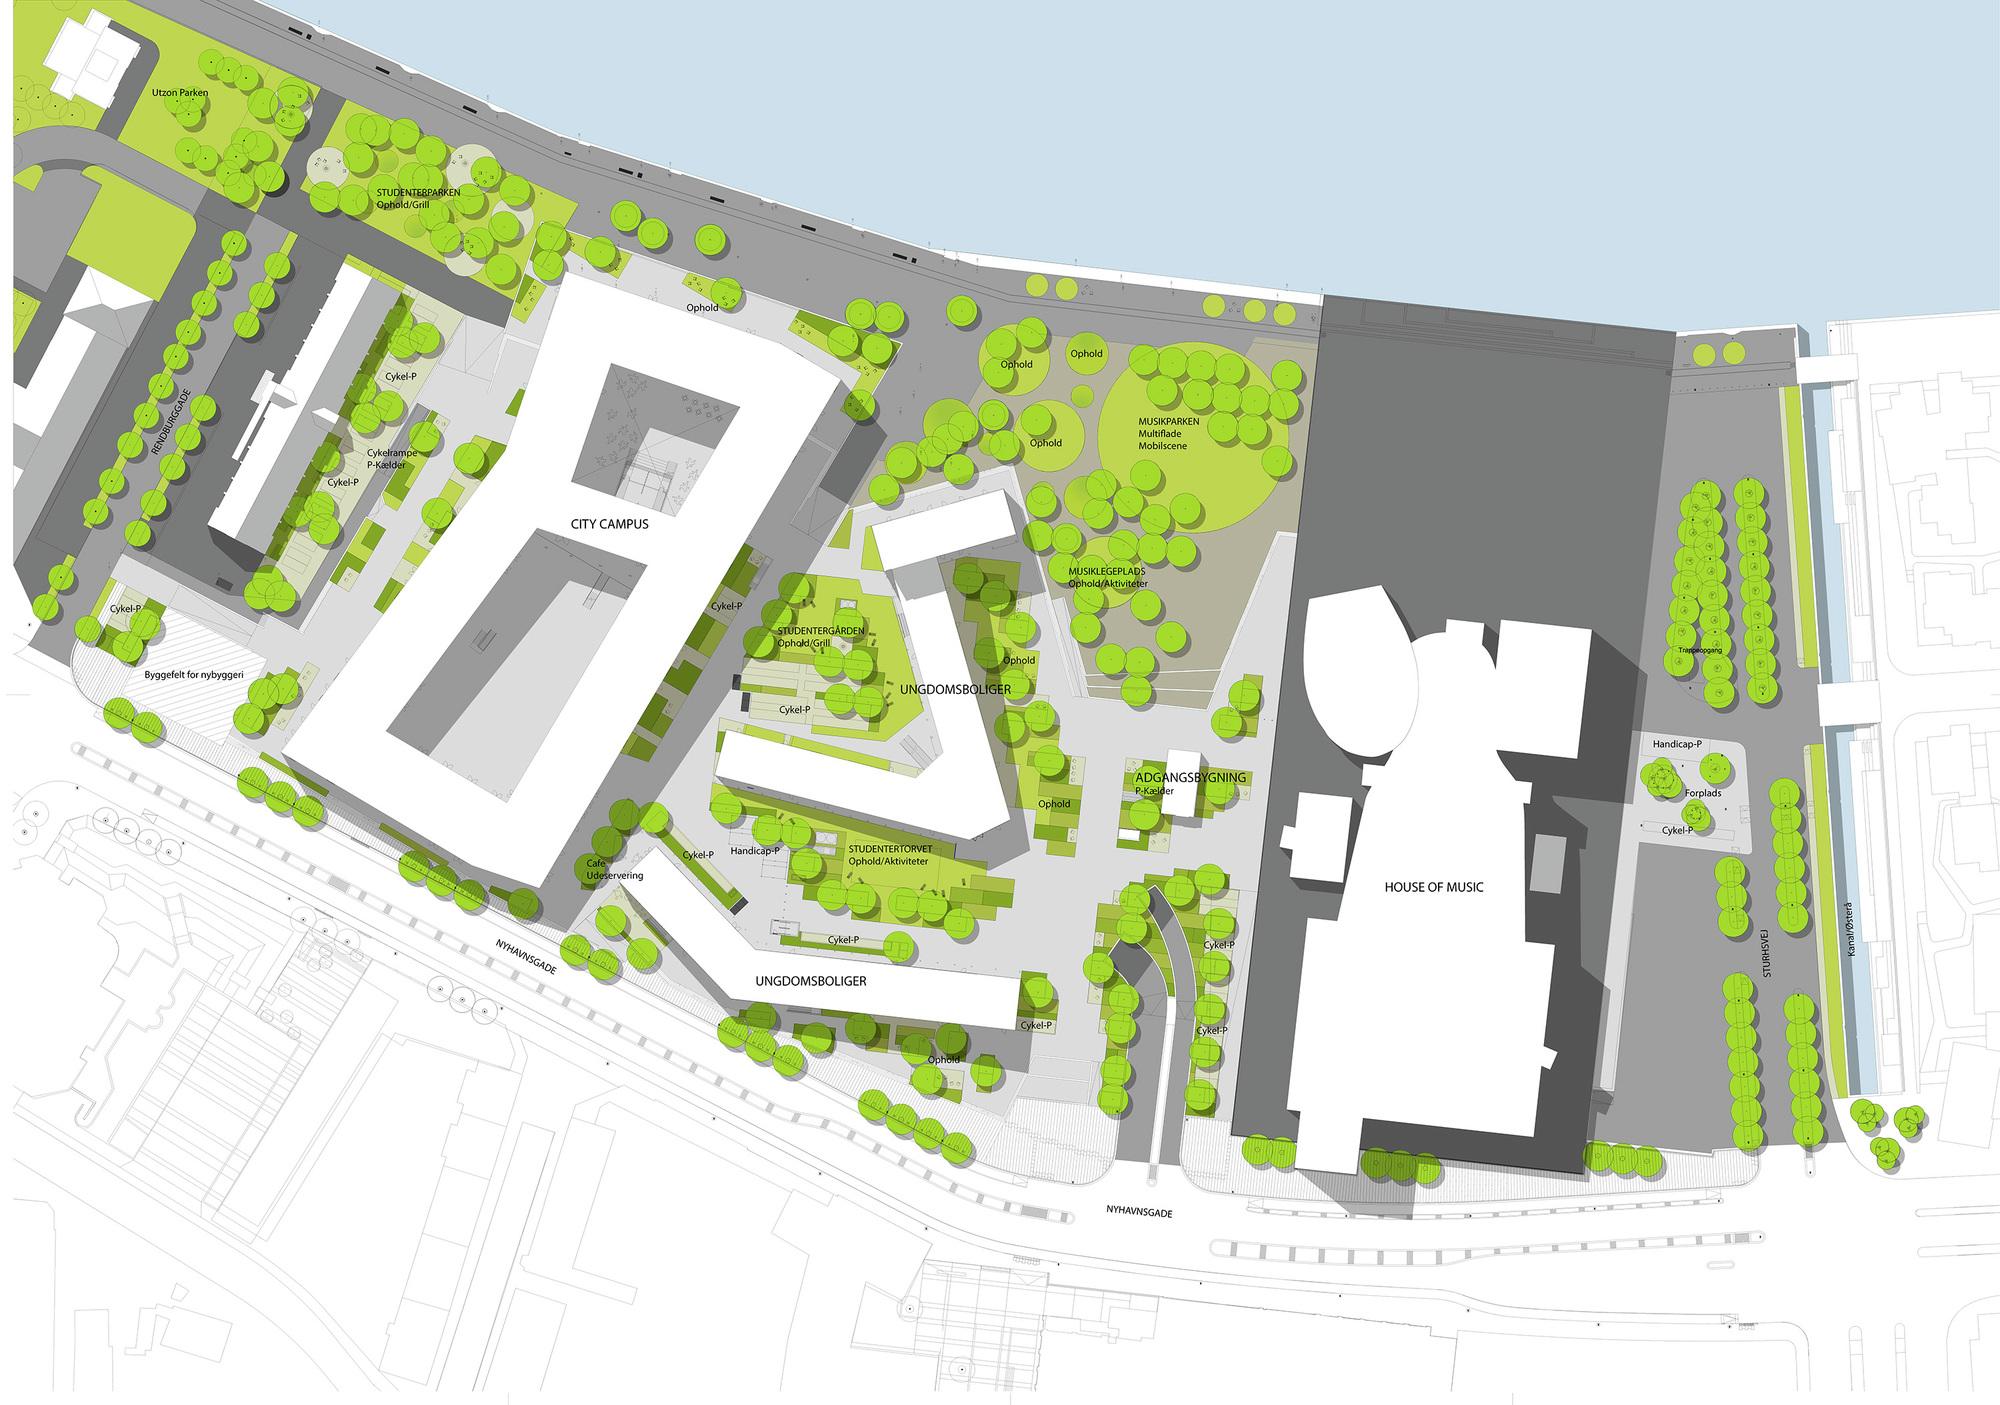 Gallery Of Aalborg Waterfront Phase Ii C F M Ller 15